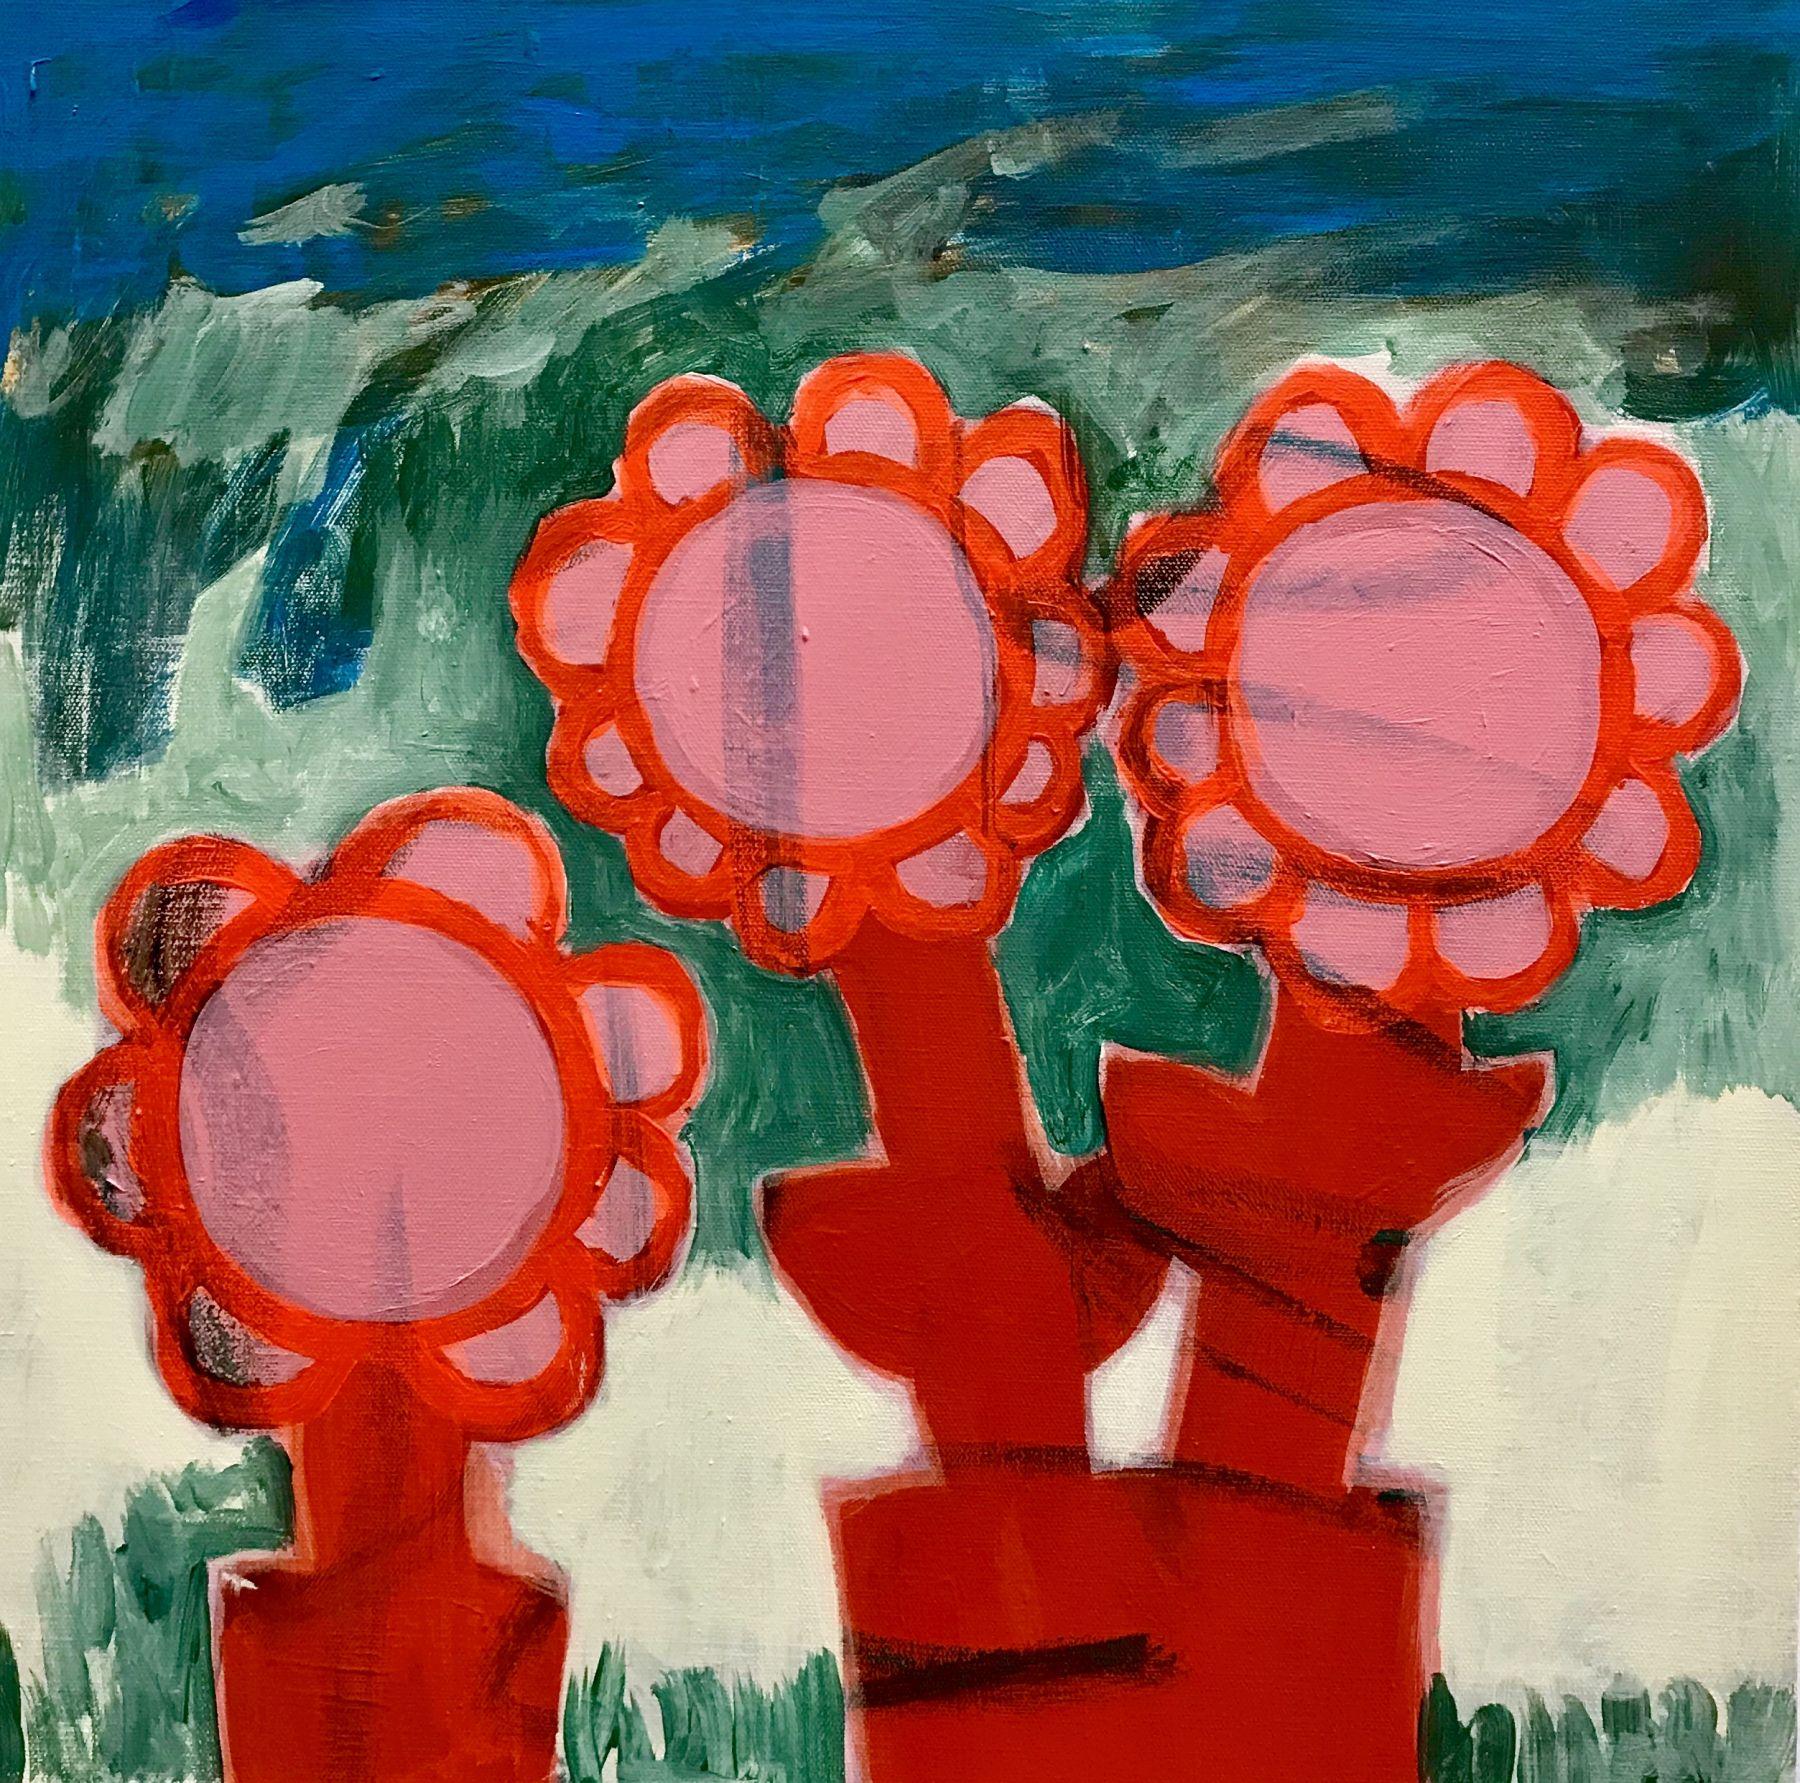 Ayse Wilson, Chunky Flowers, 2019